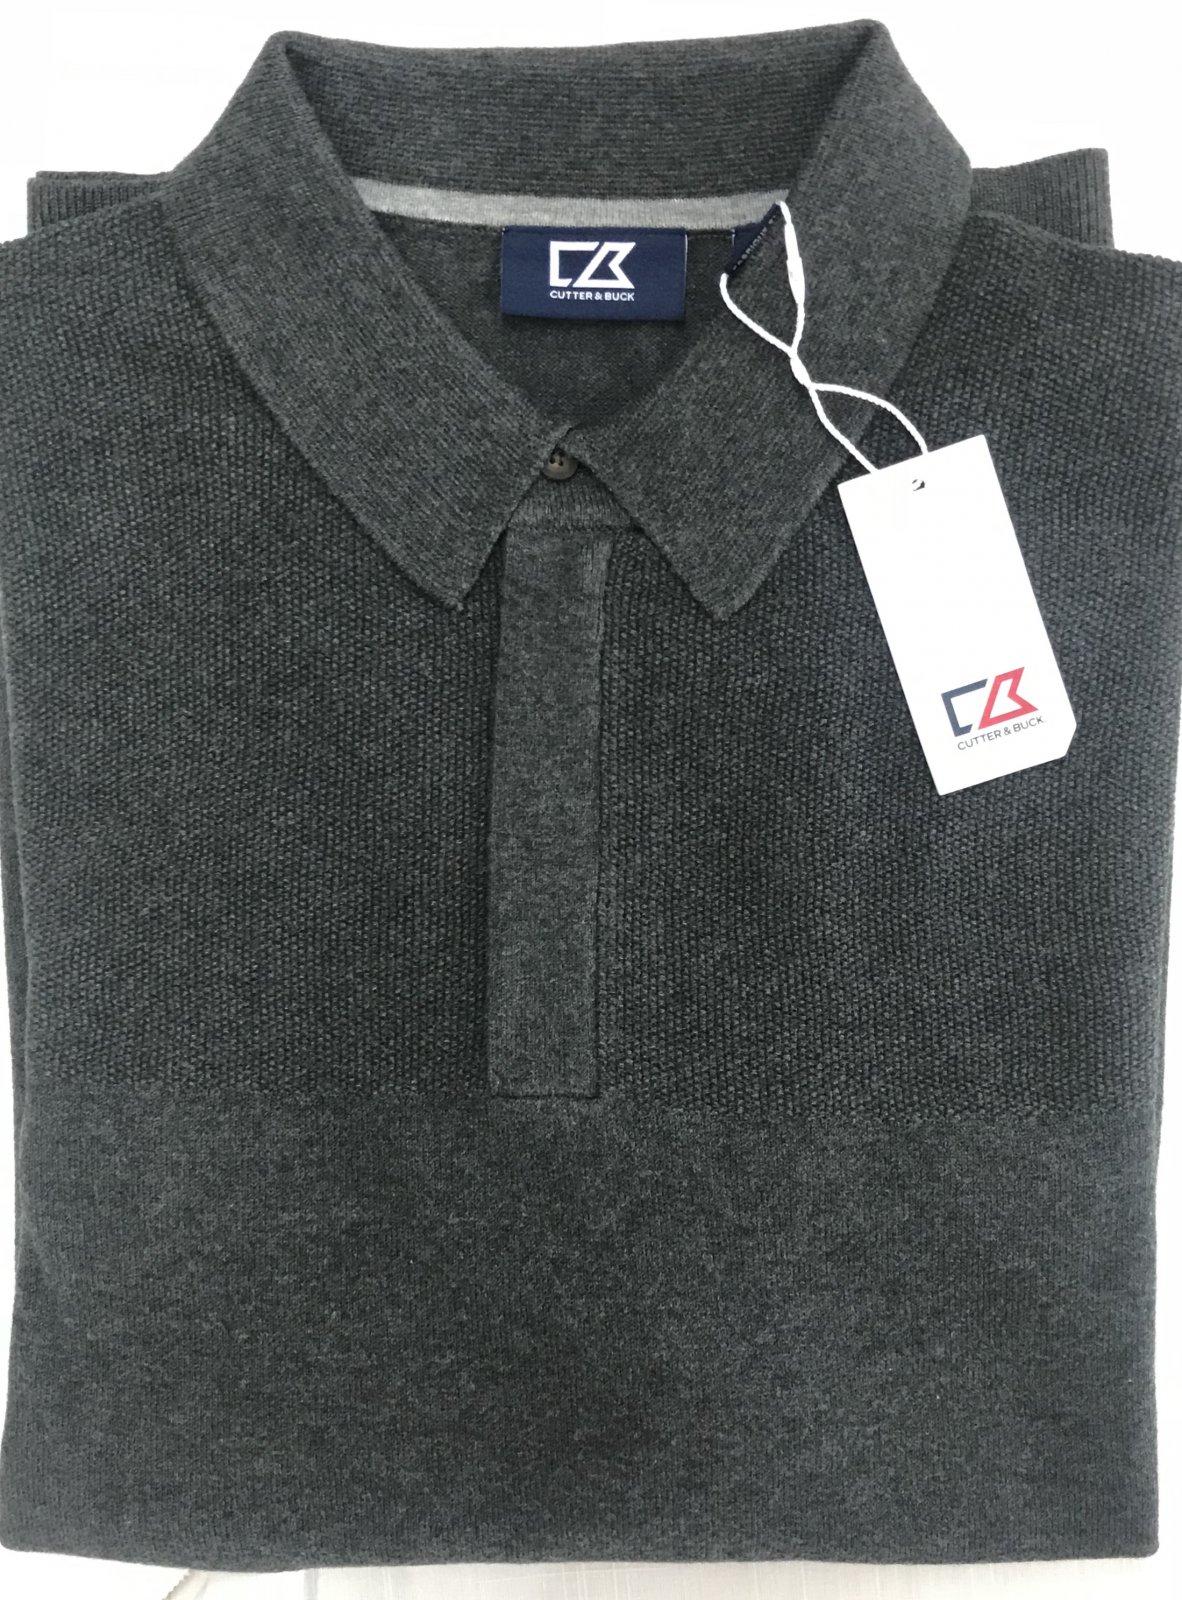 Cutter & Buck Lakemont Zip Polo Sweater